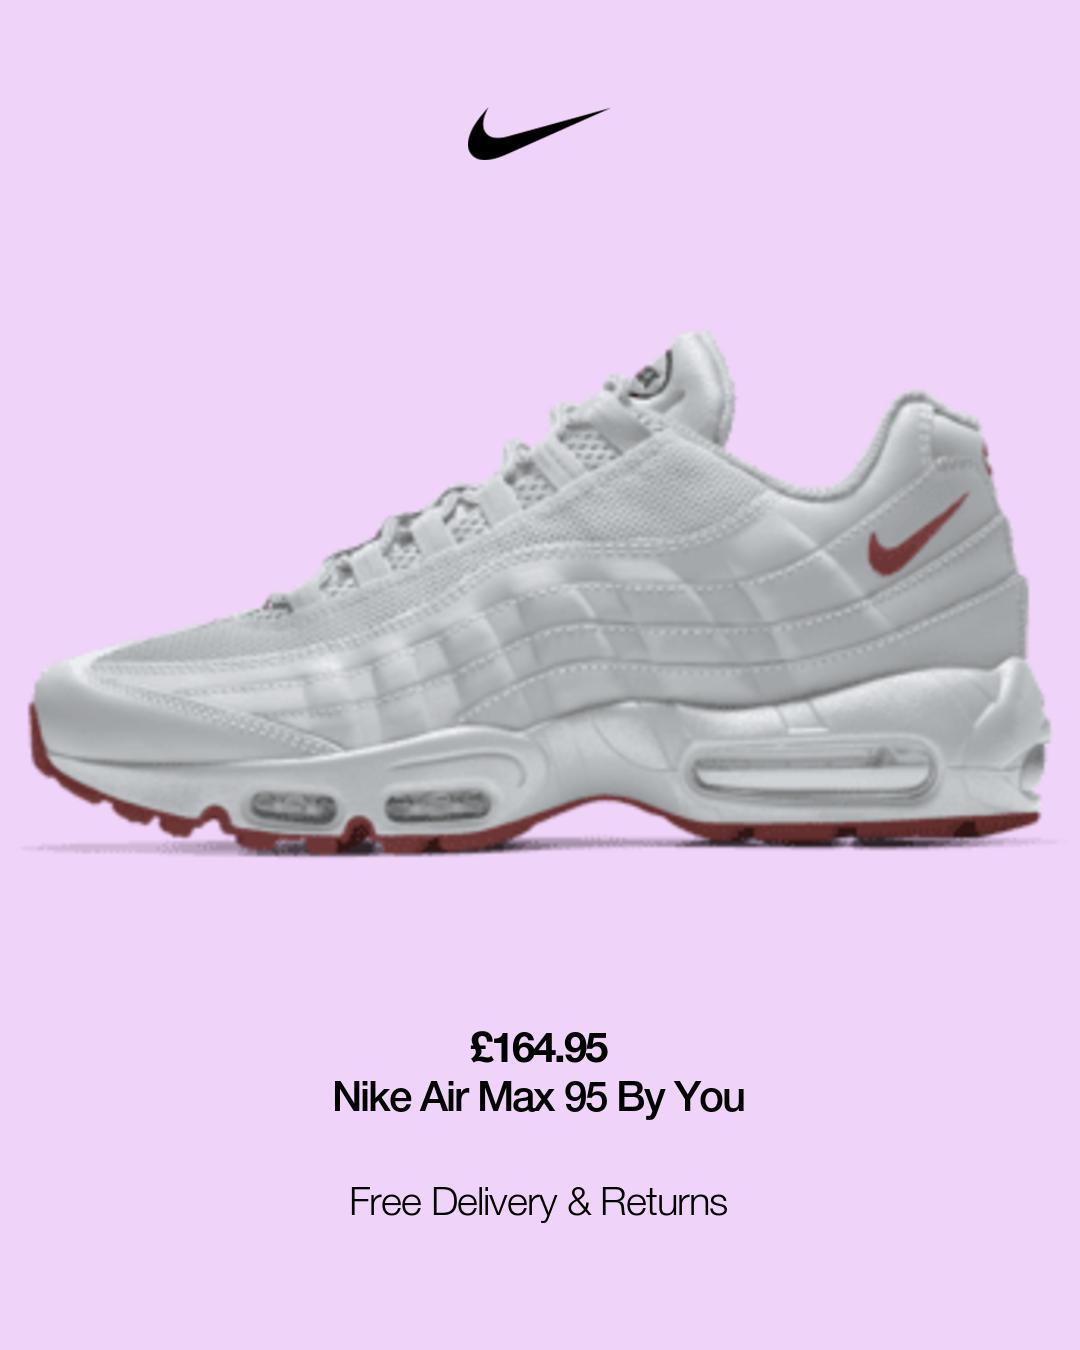 Nike Air Max 95 By You in 2021   Nike air max, Air max, Air max 95